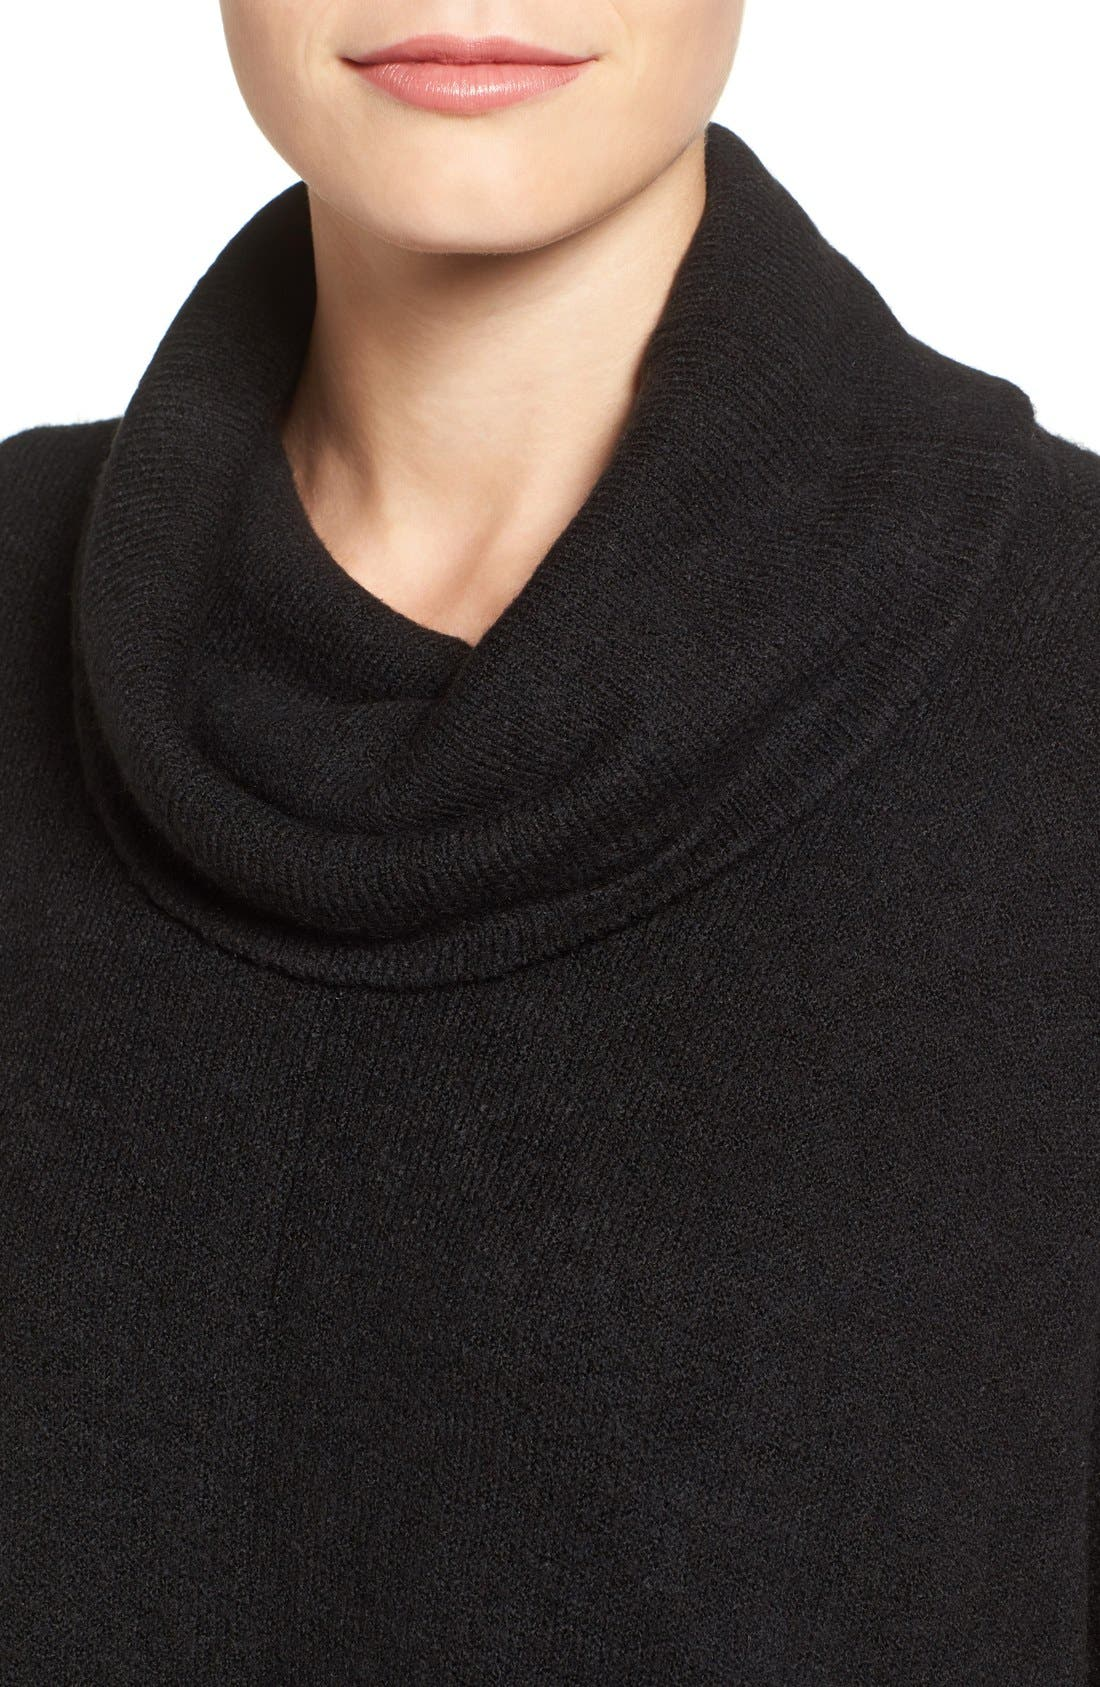 Cowl Neck Sweater Poncho,                             Alternate thumbnail 4, color,                             Black